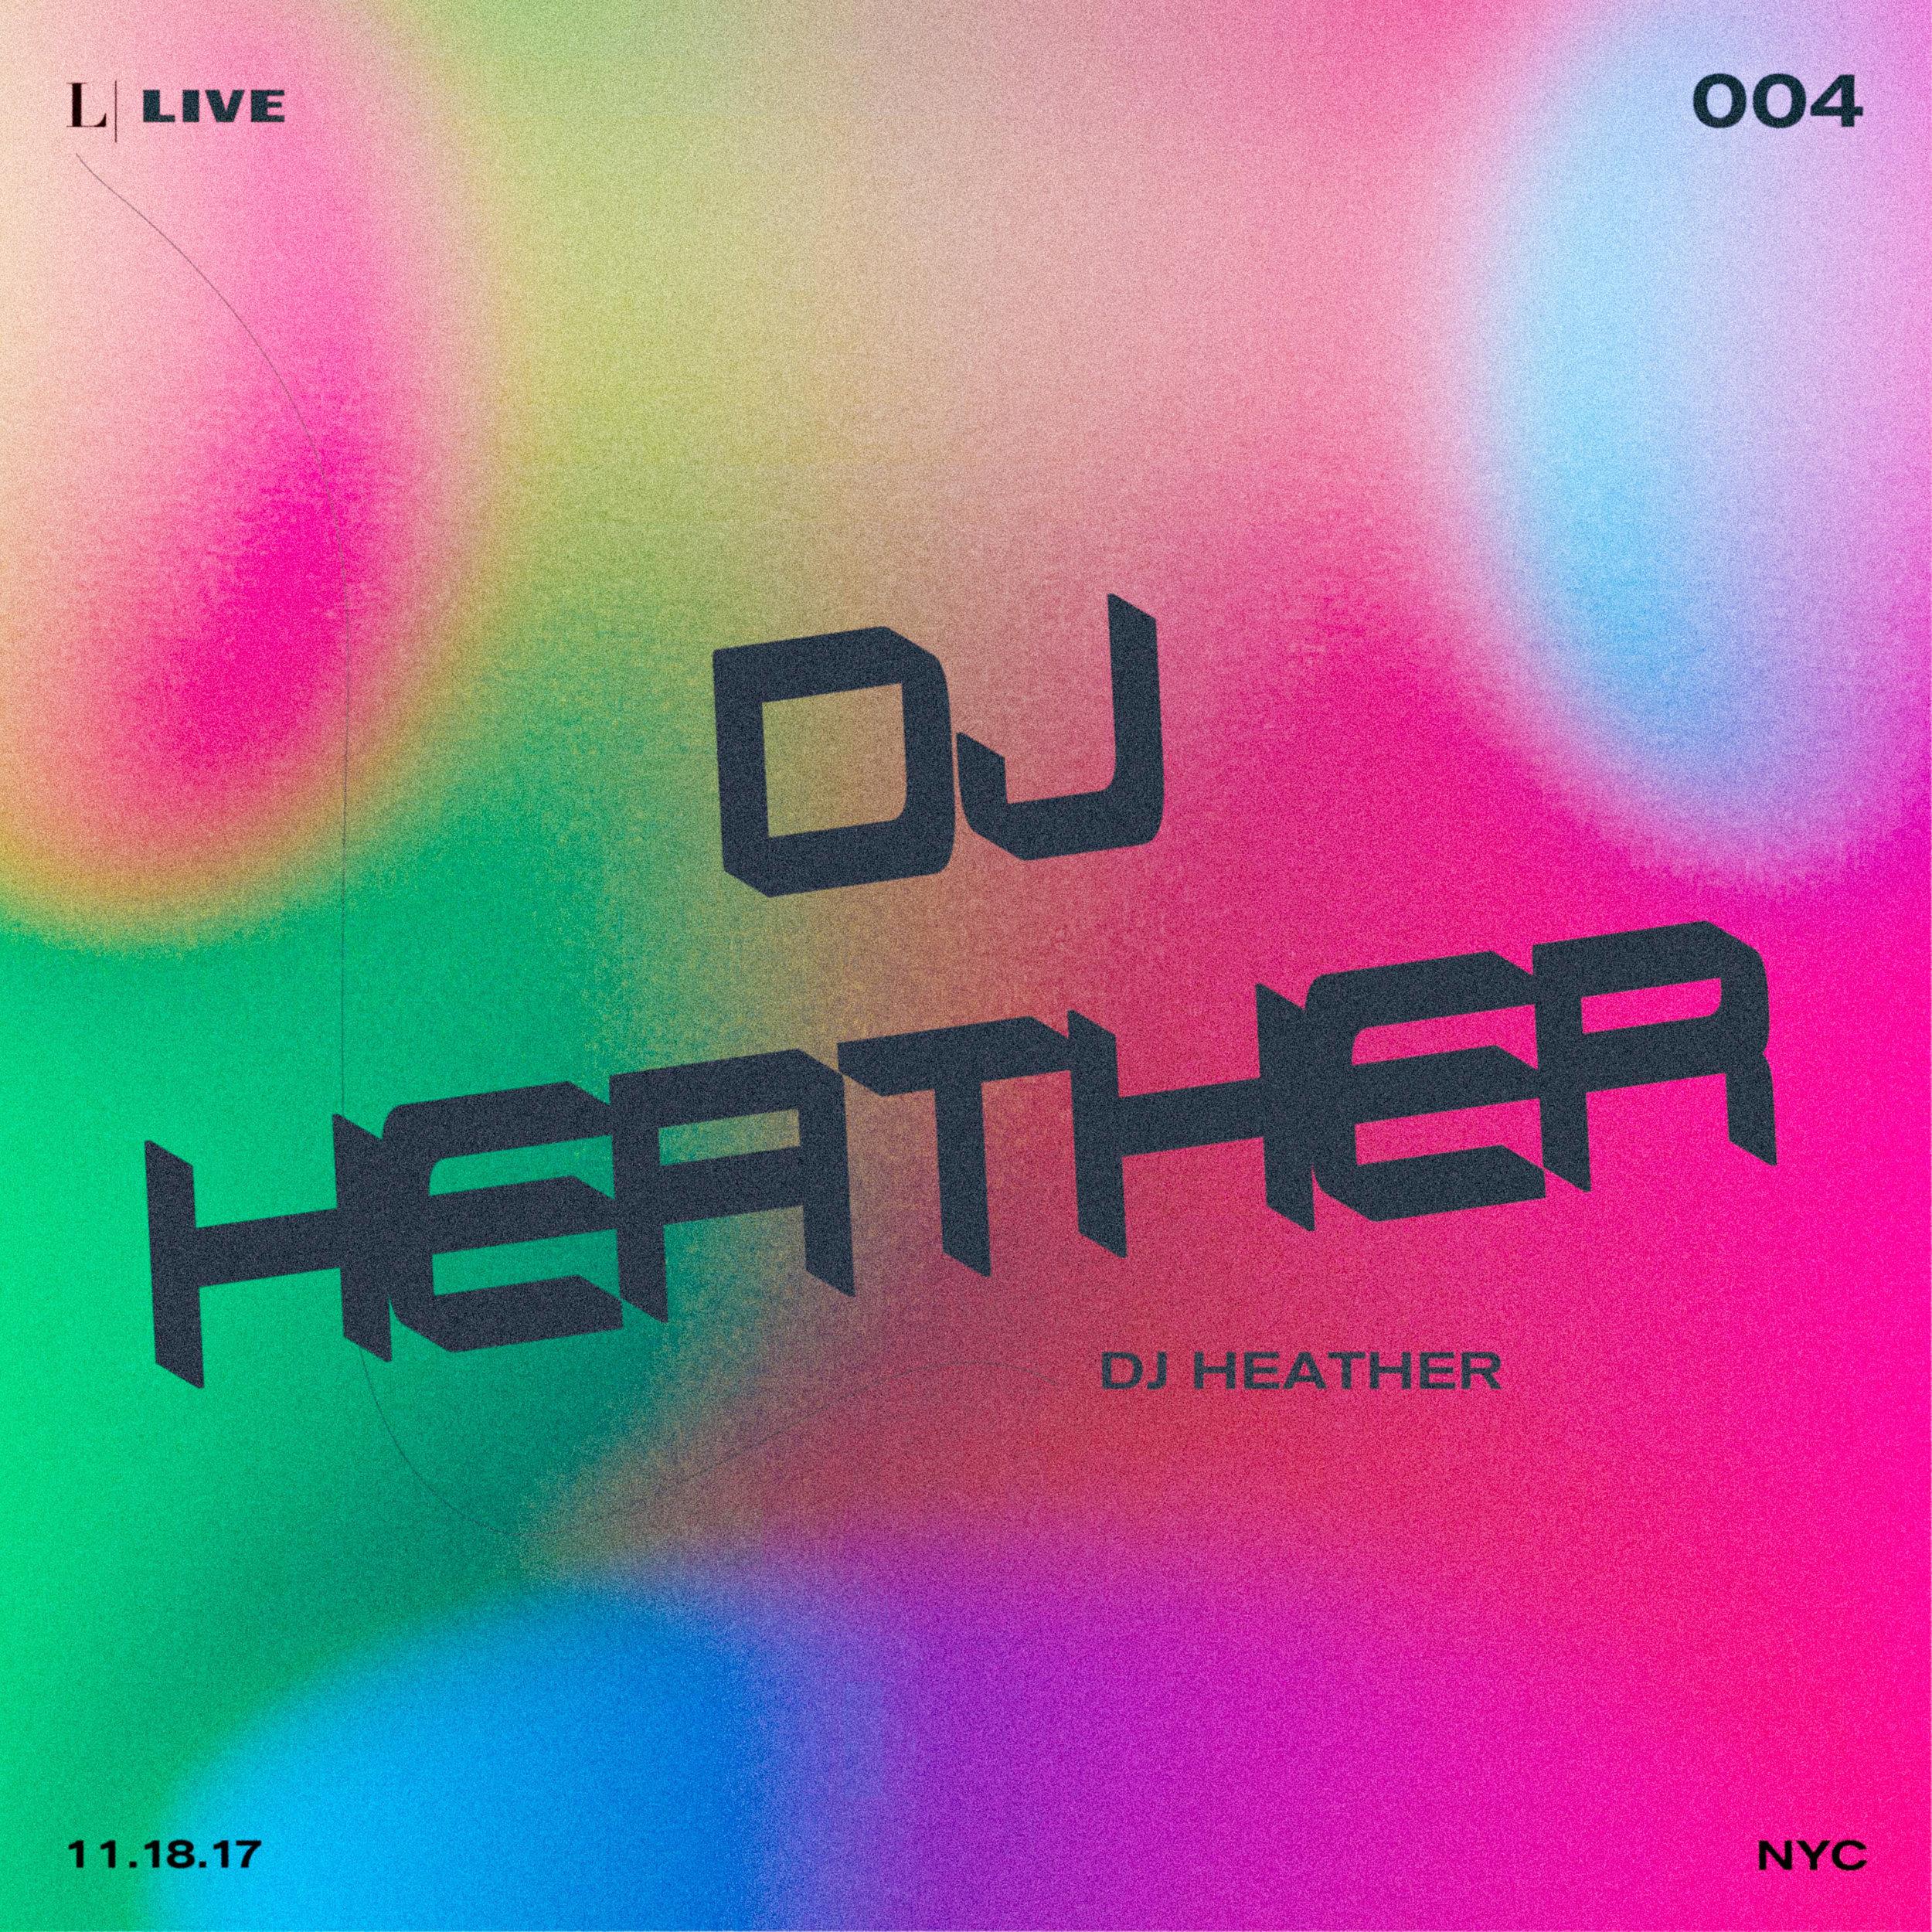 LeitLive-DJ_Heather_Brighter.jpeg